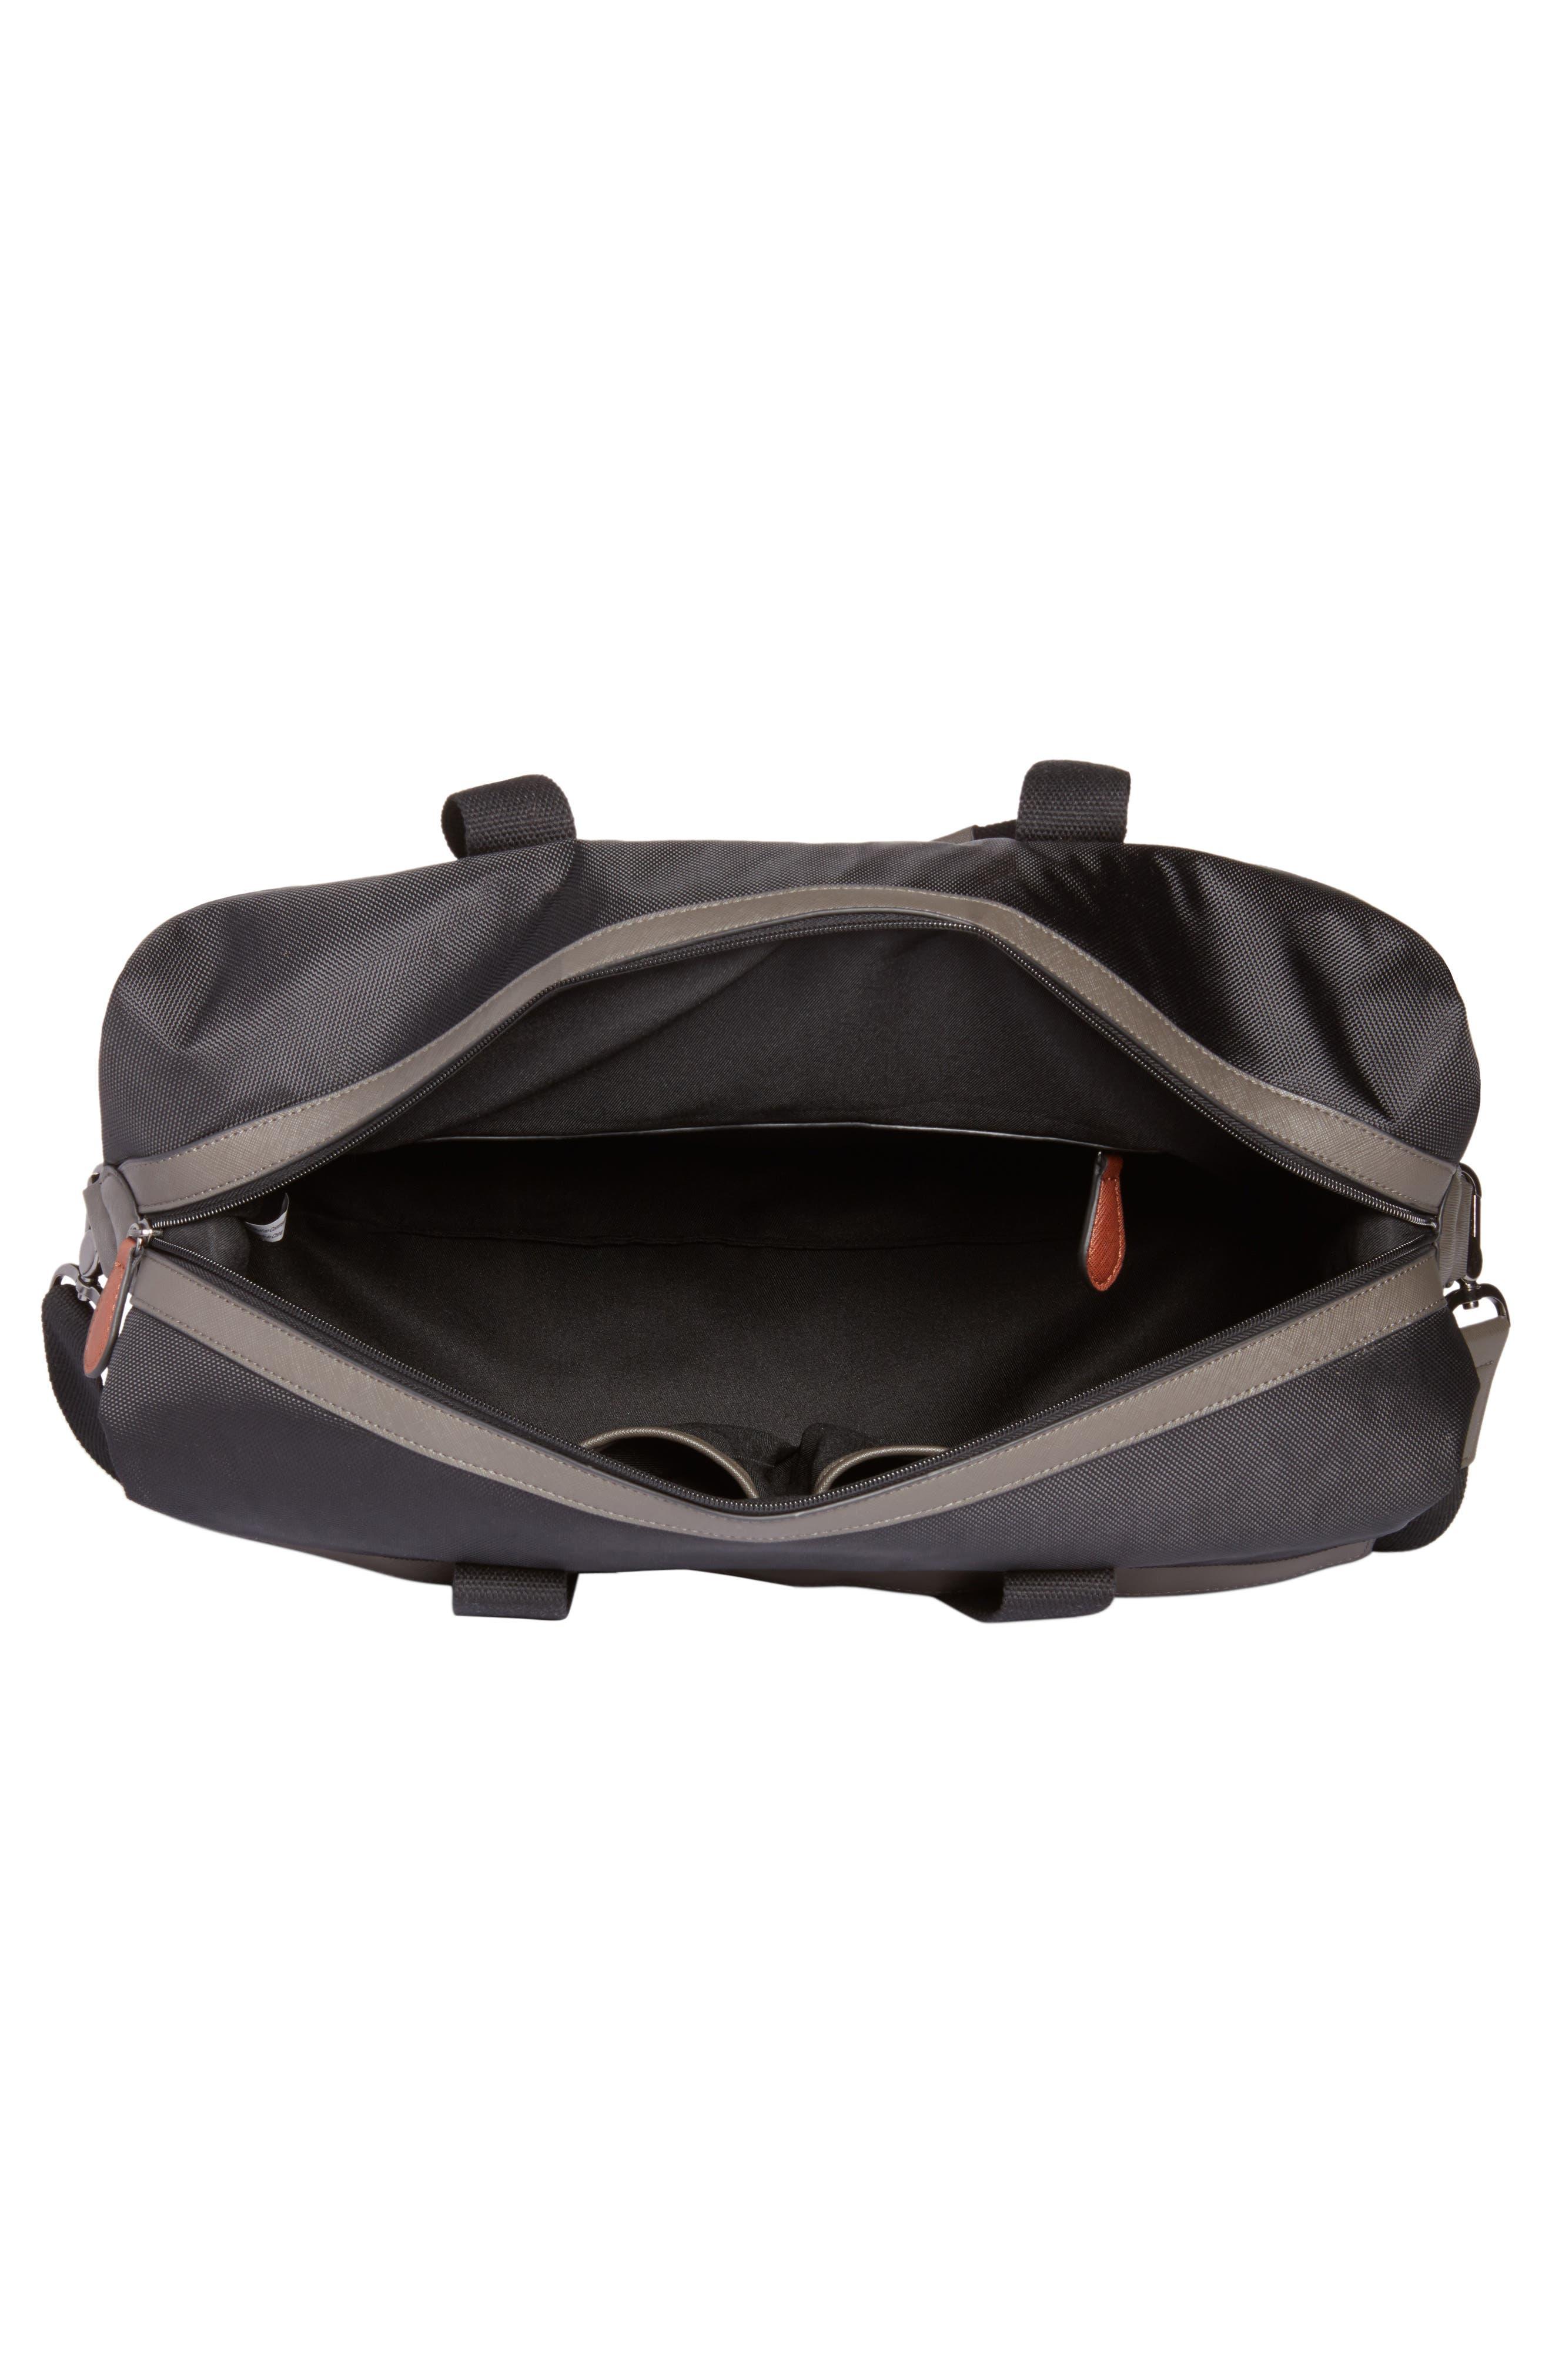 Zeebee Duffel Bag,                             Alternate thumbnail 4, color,                             Black